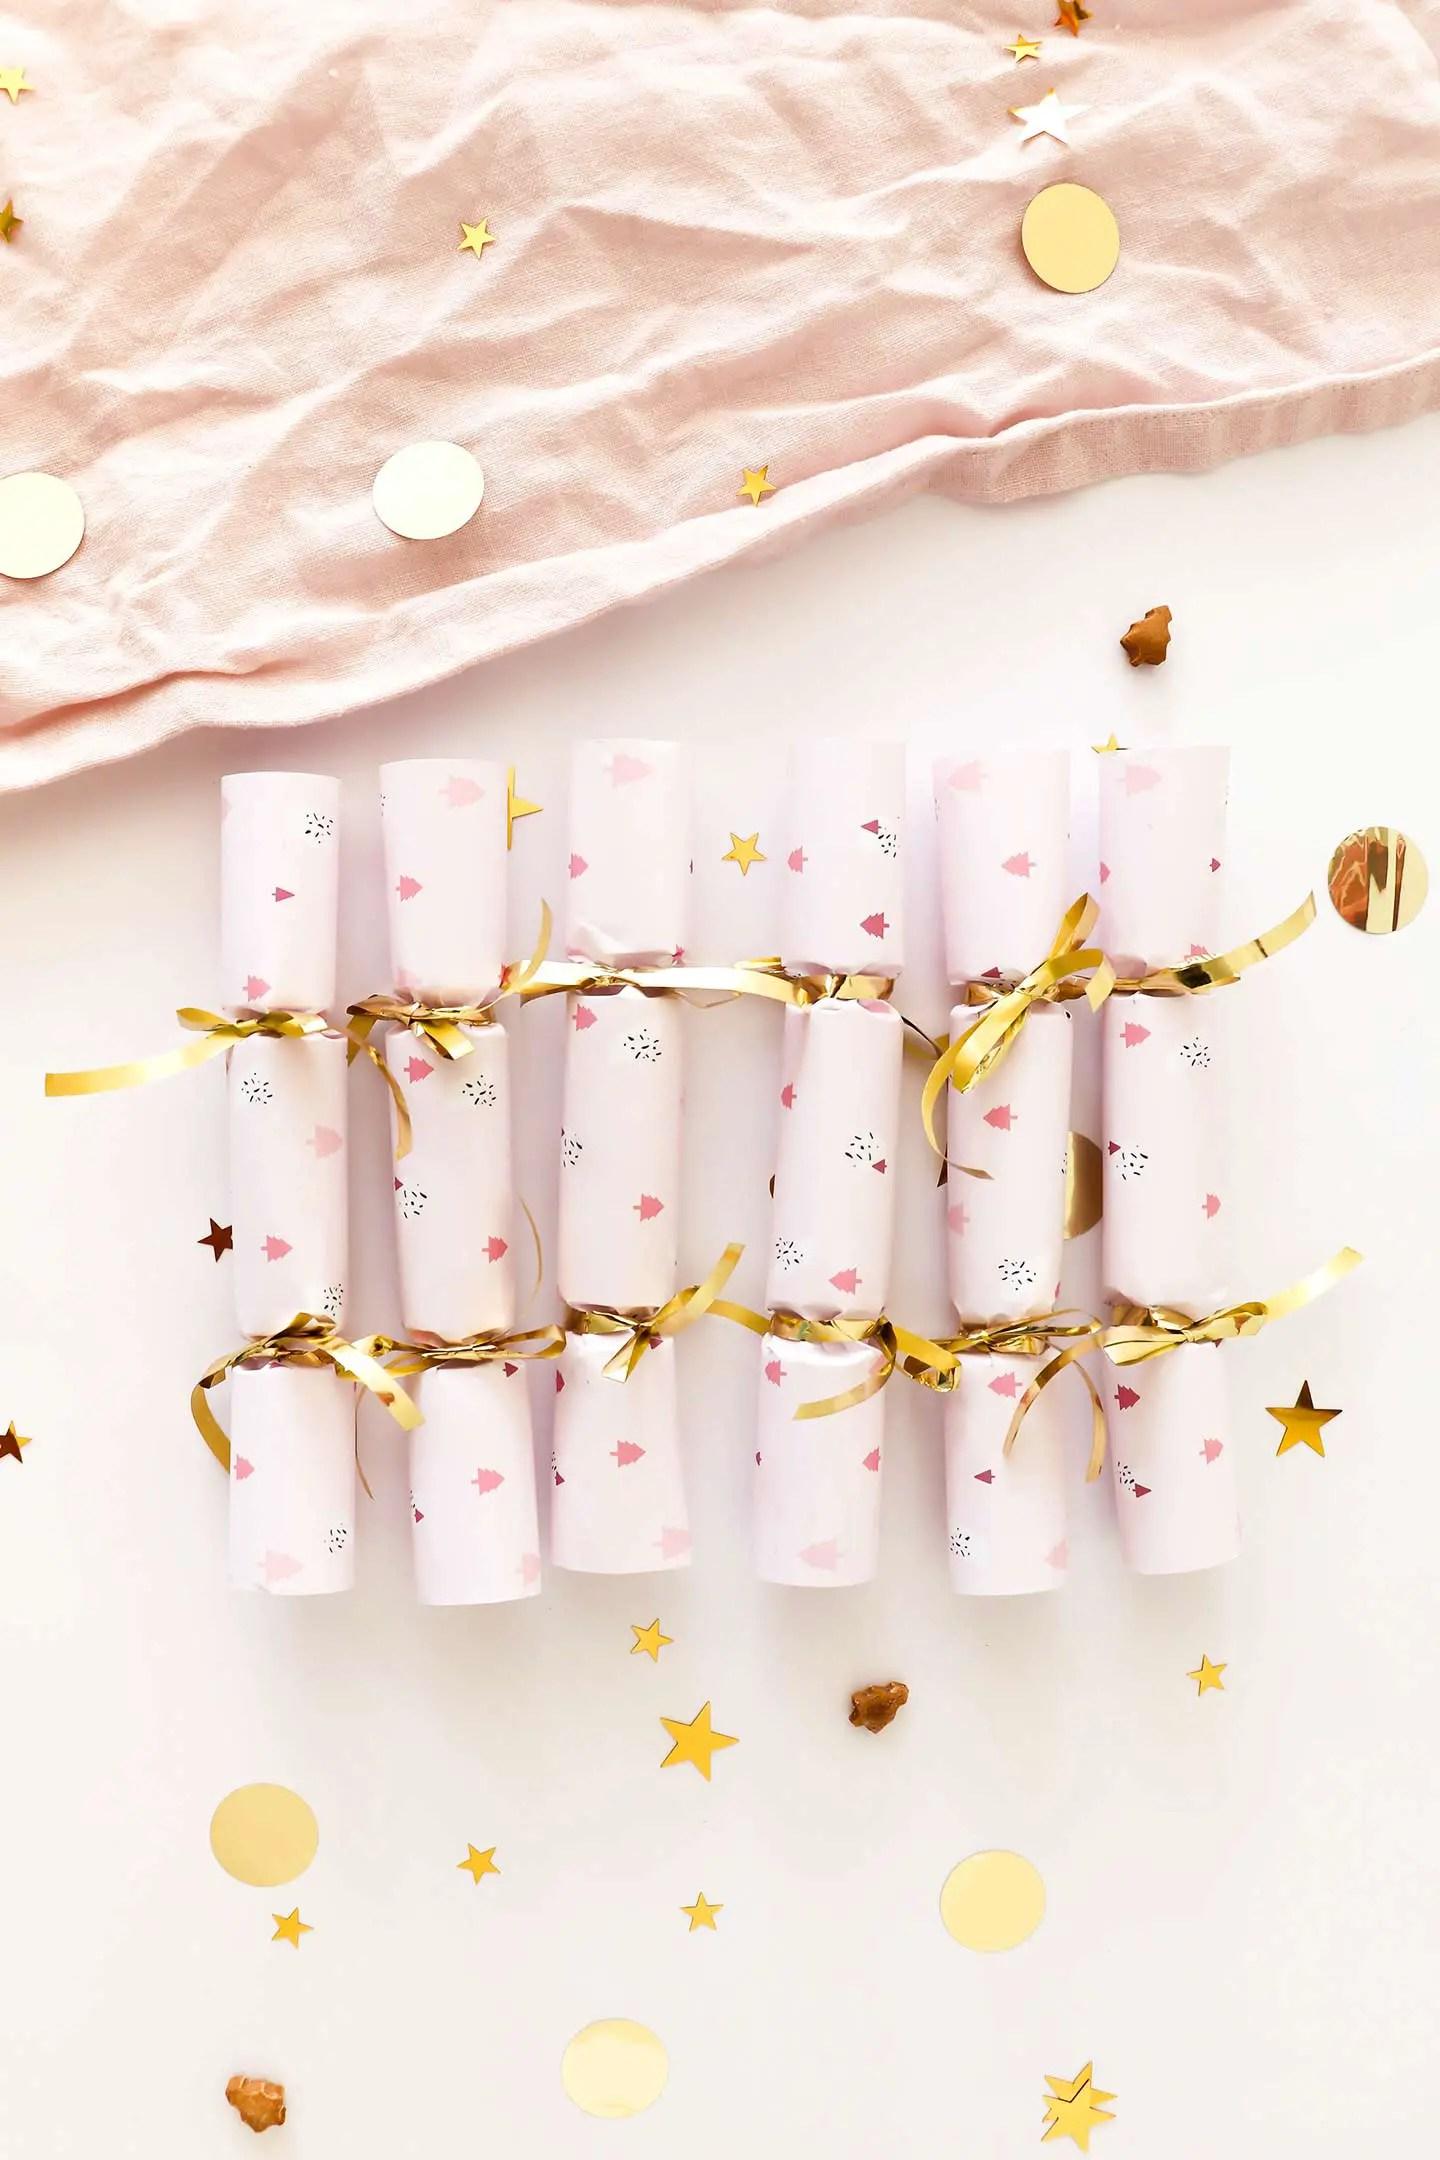 Fabriquer des crackers de Noël